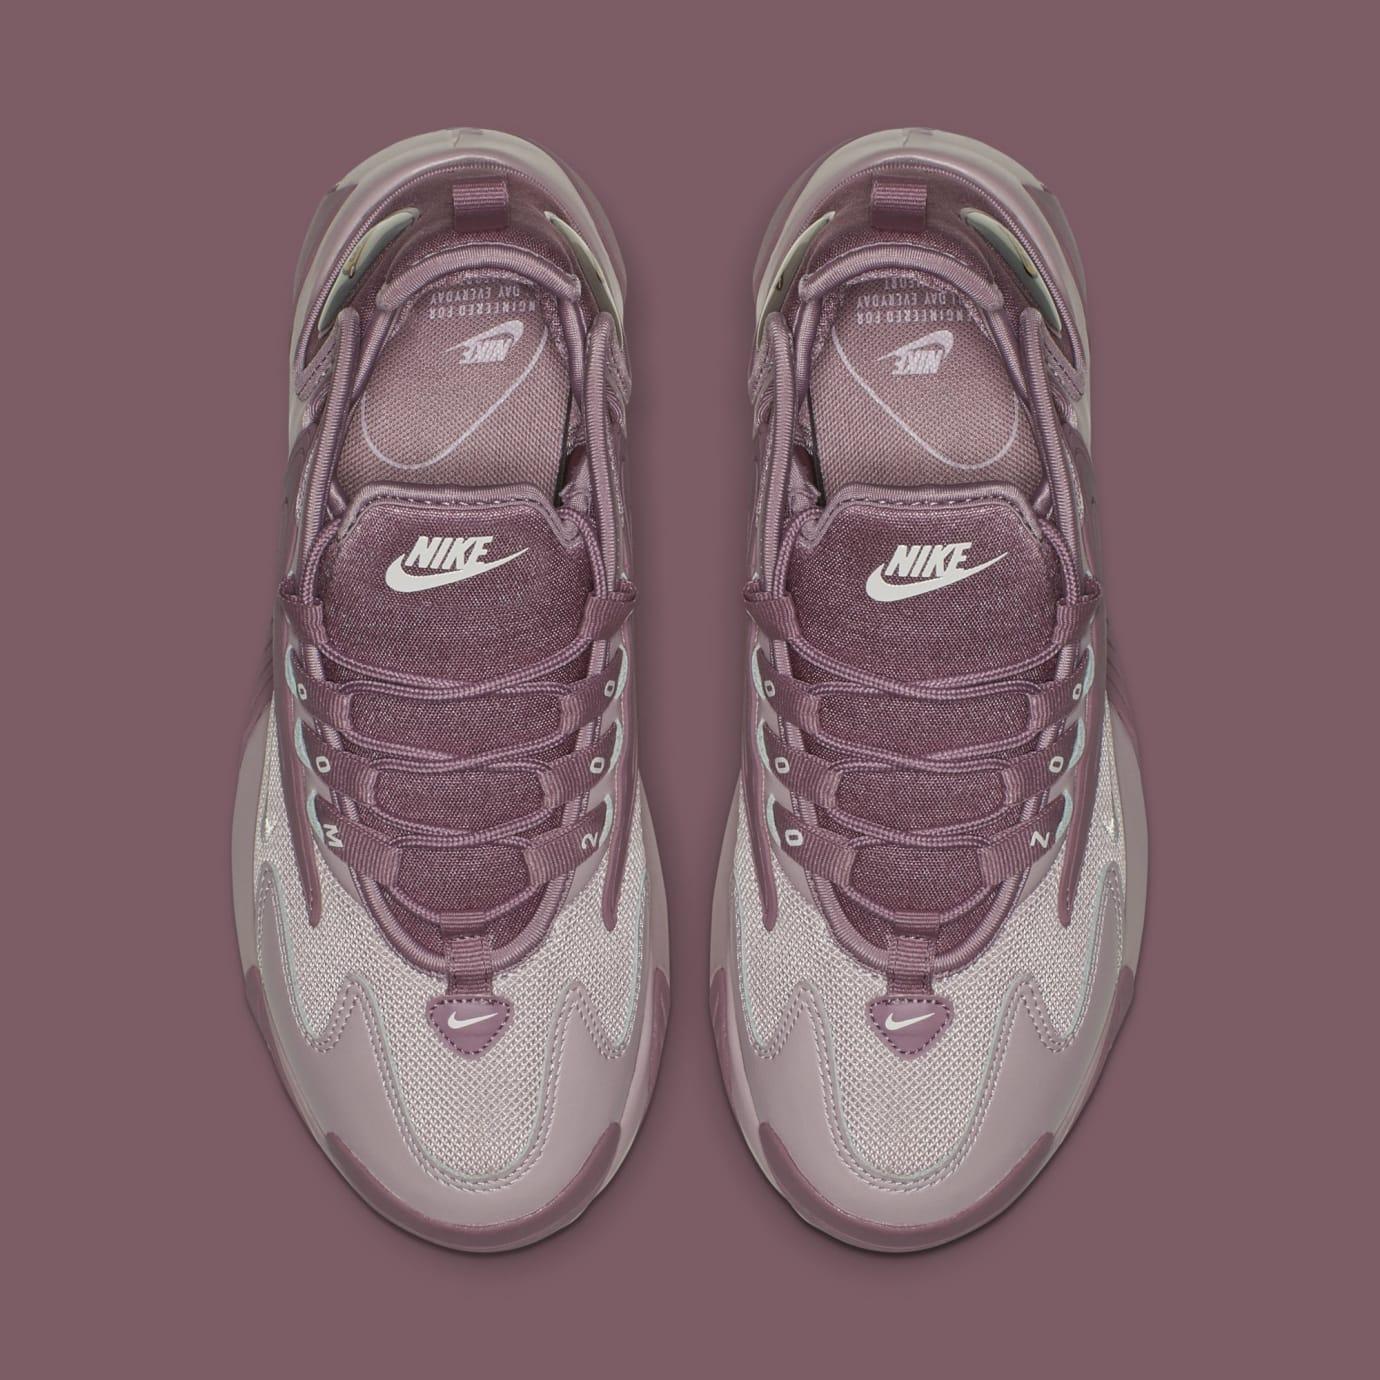 Nike Zoom 2K AO0354-500 (Top)